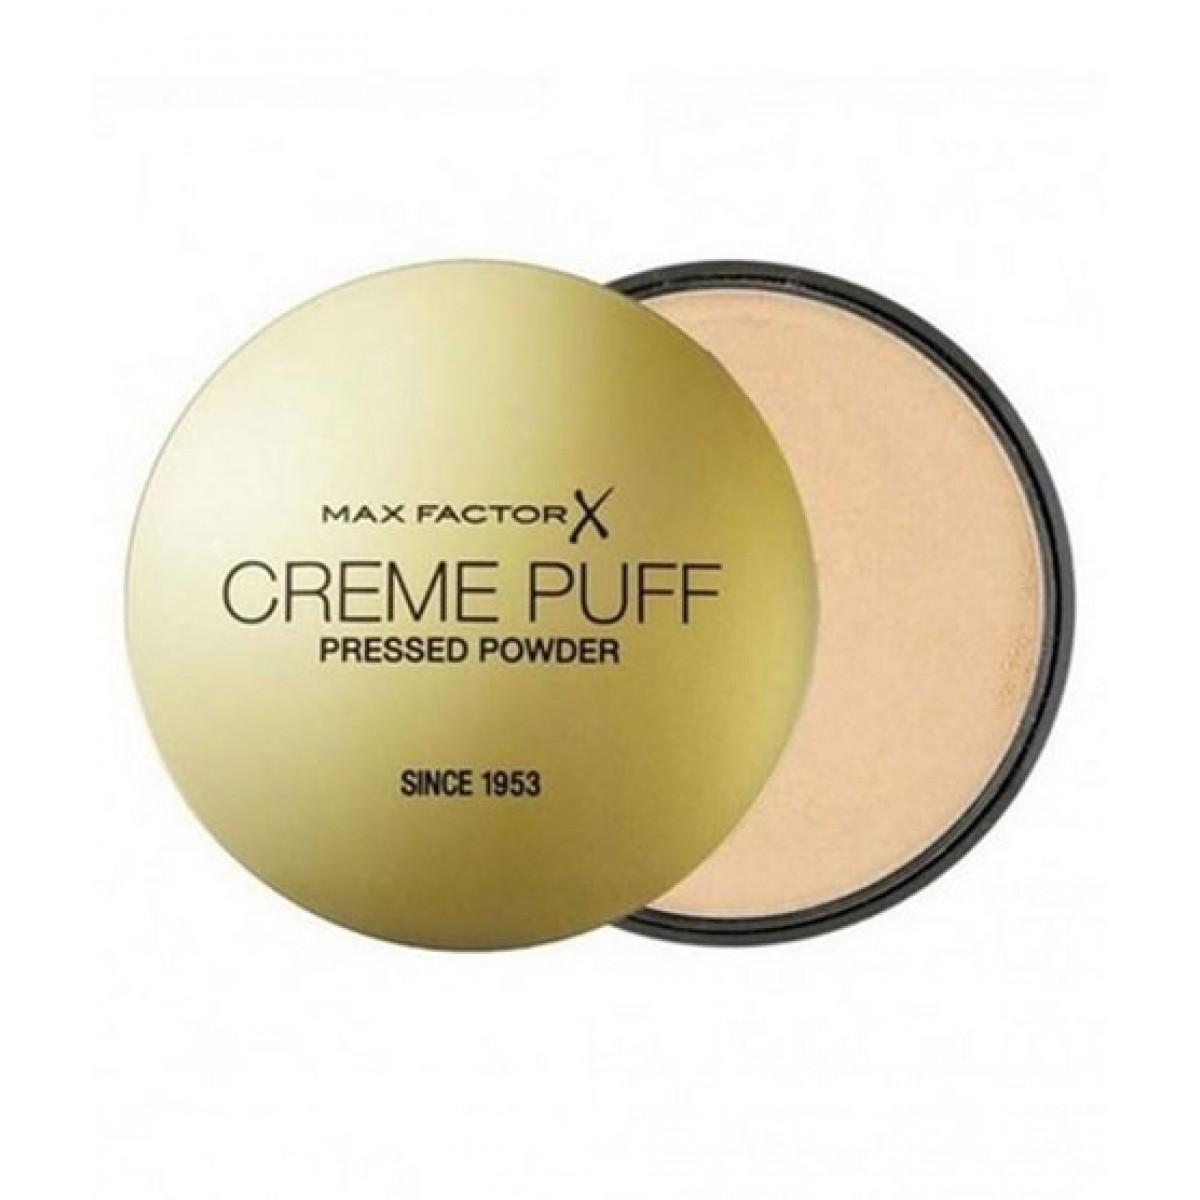 Moderne Max Factor Creme Puff Pressed Powder Price in Pakistan | Buy Max GB-89